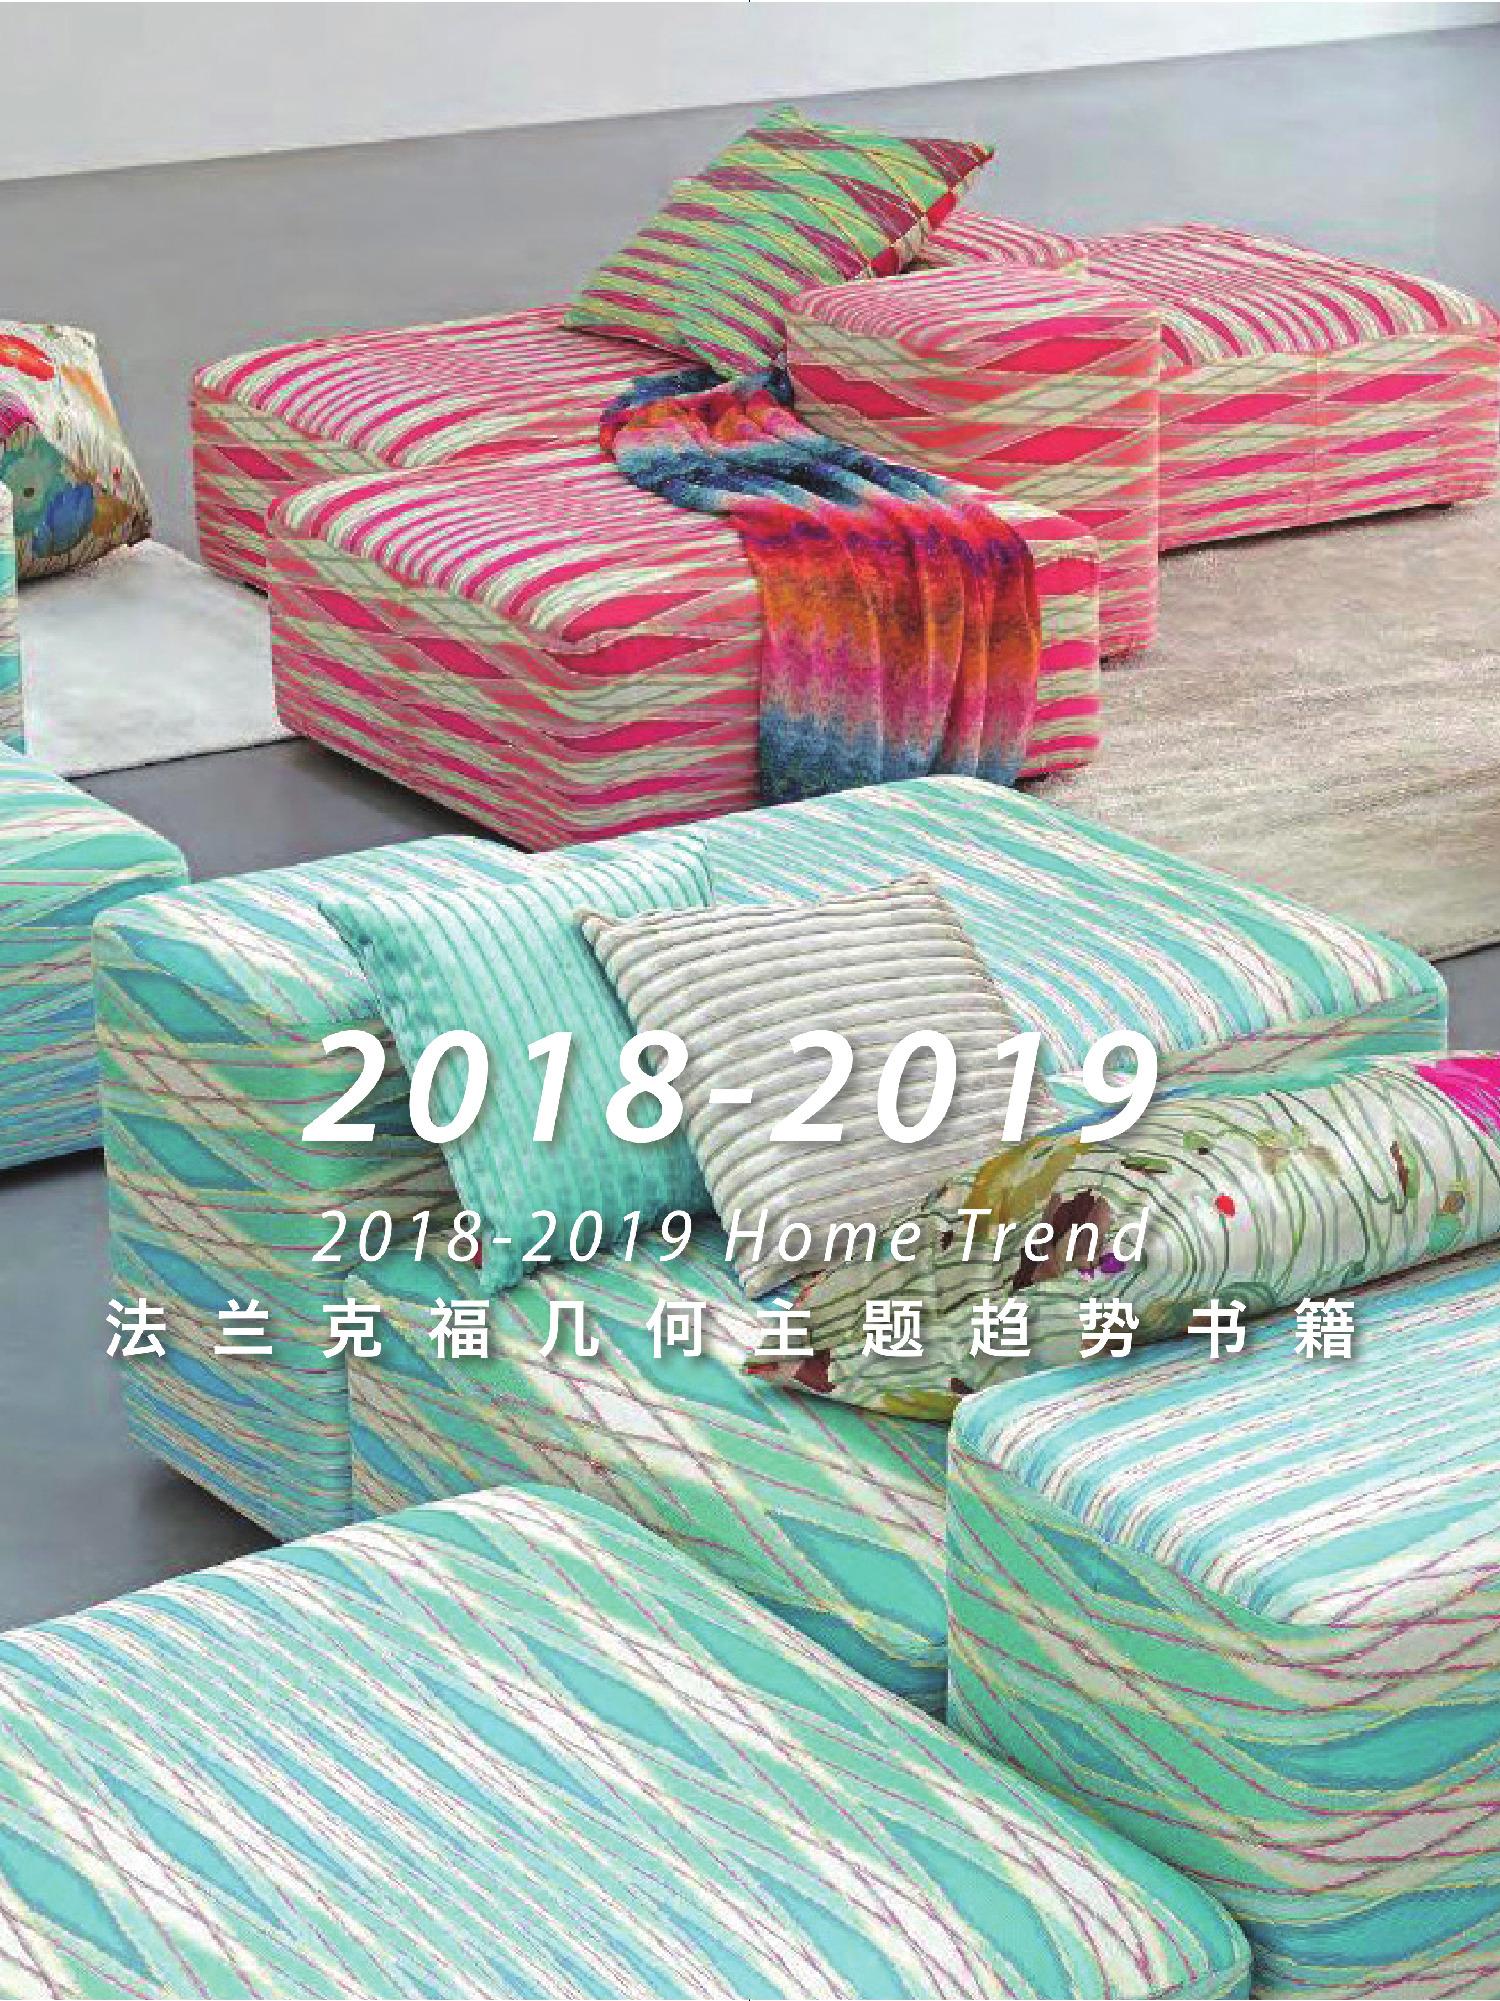 《HOME TREND》2018-2019法兰克福几何主题趋势书籍(一)